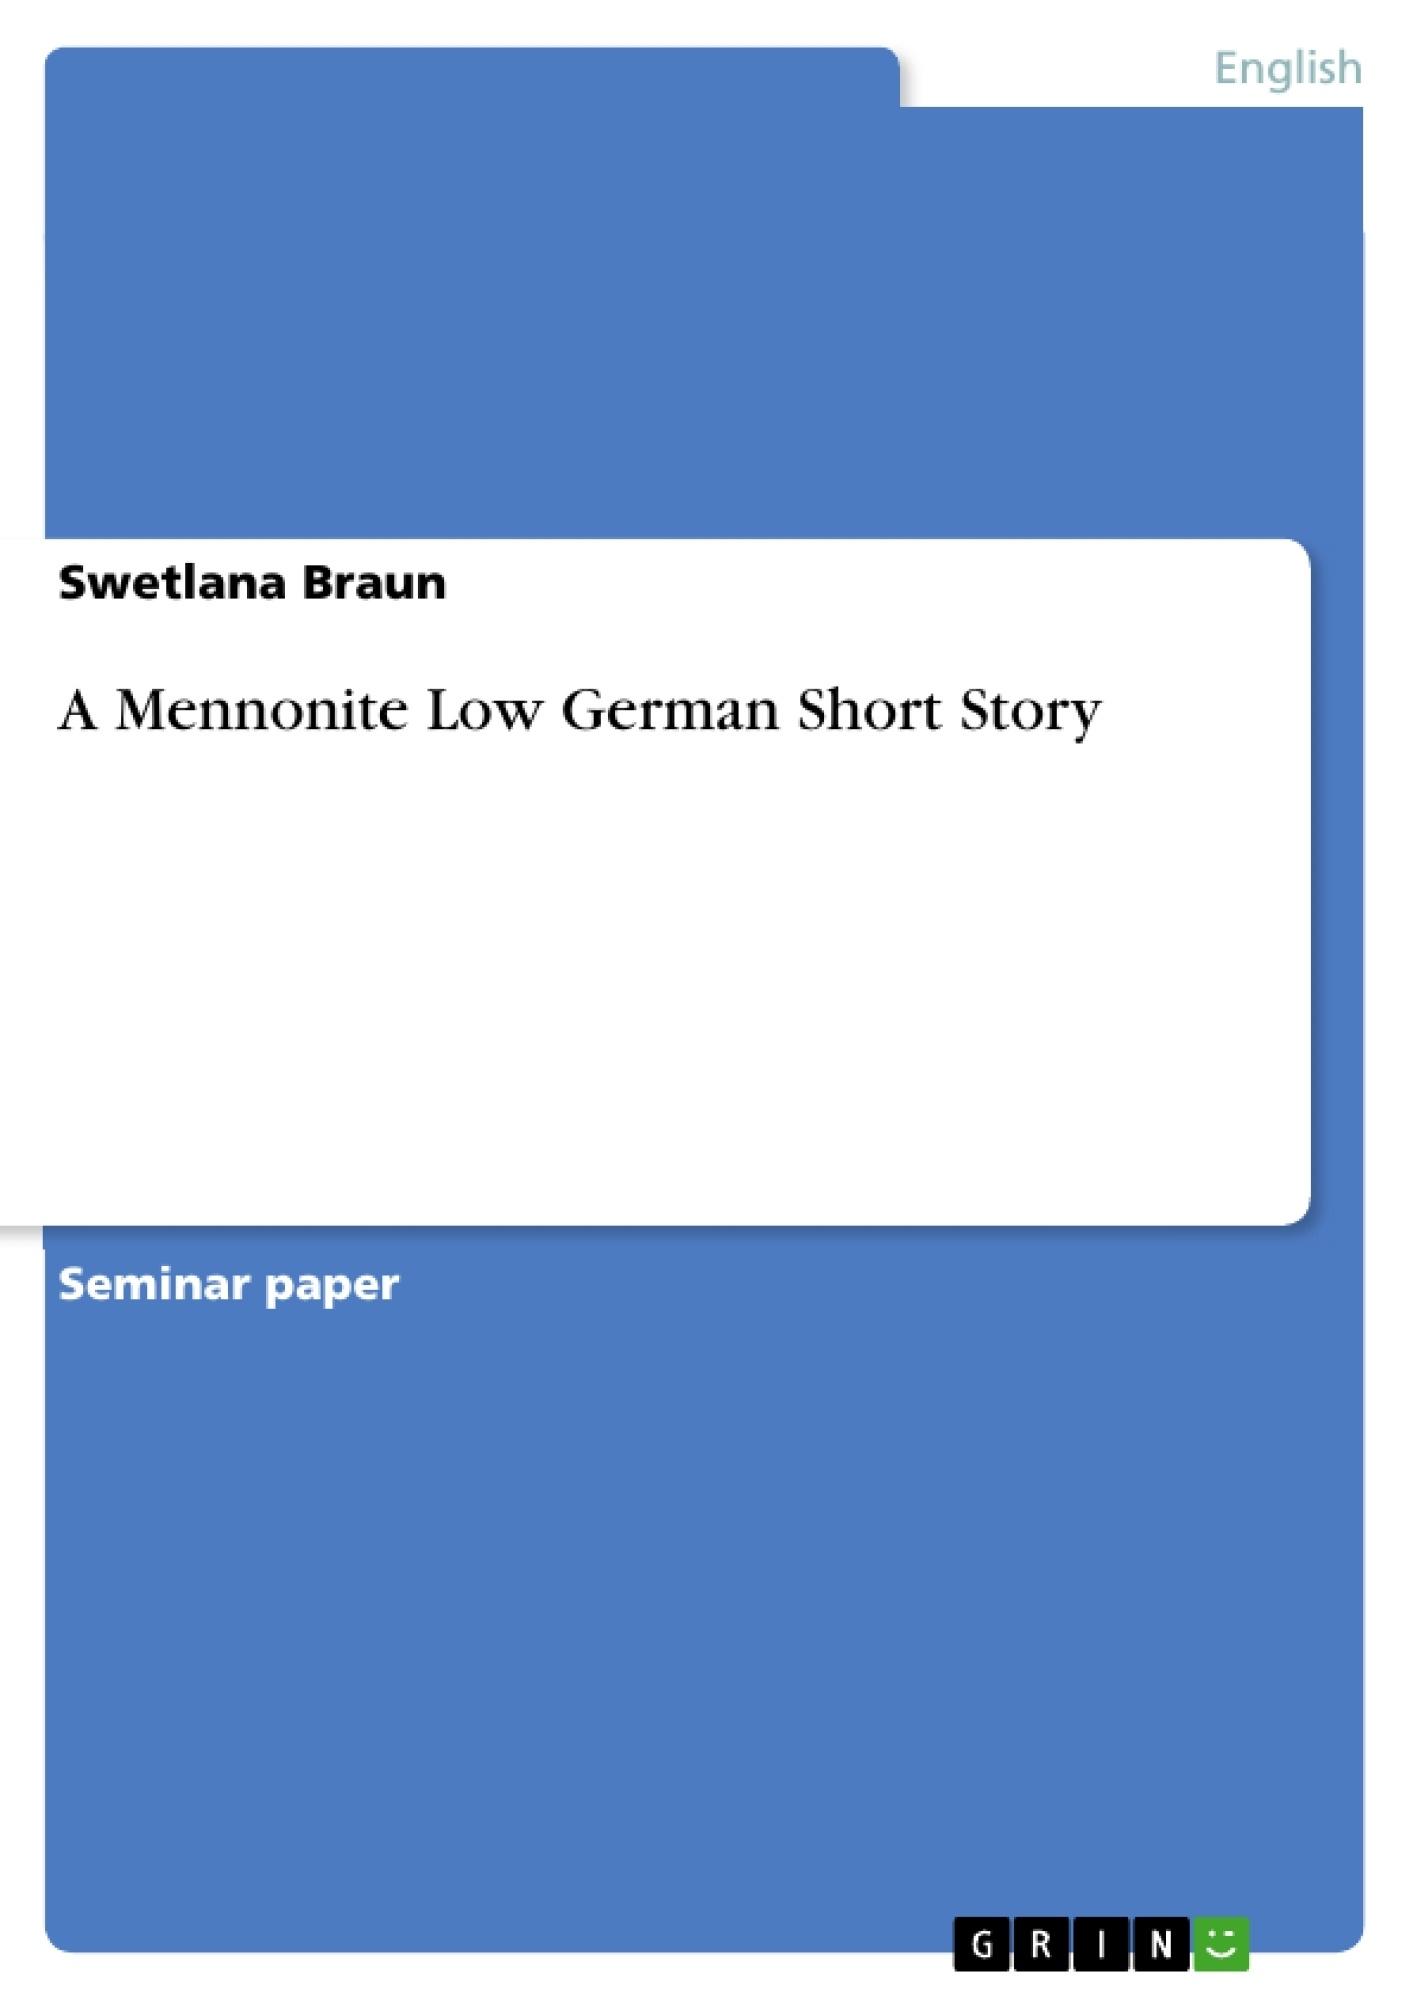 Title: A Mennonite Low German Short Story